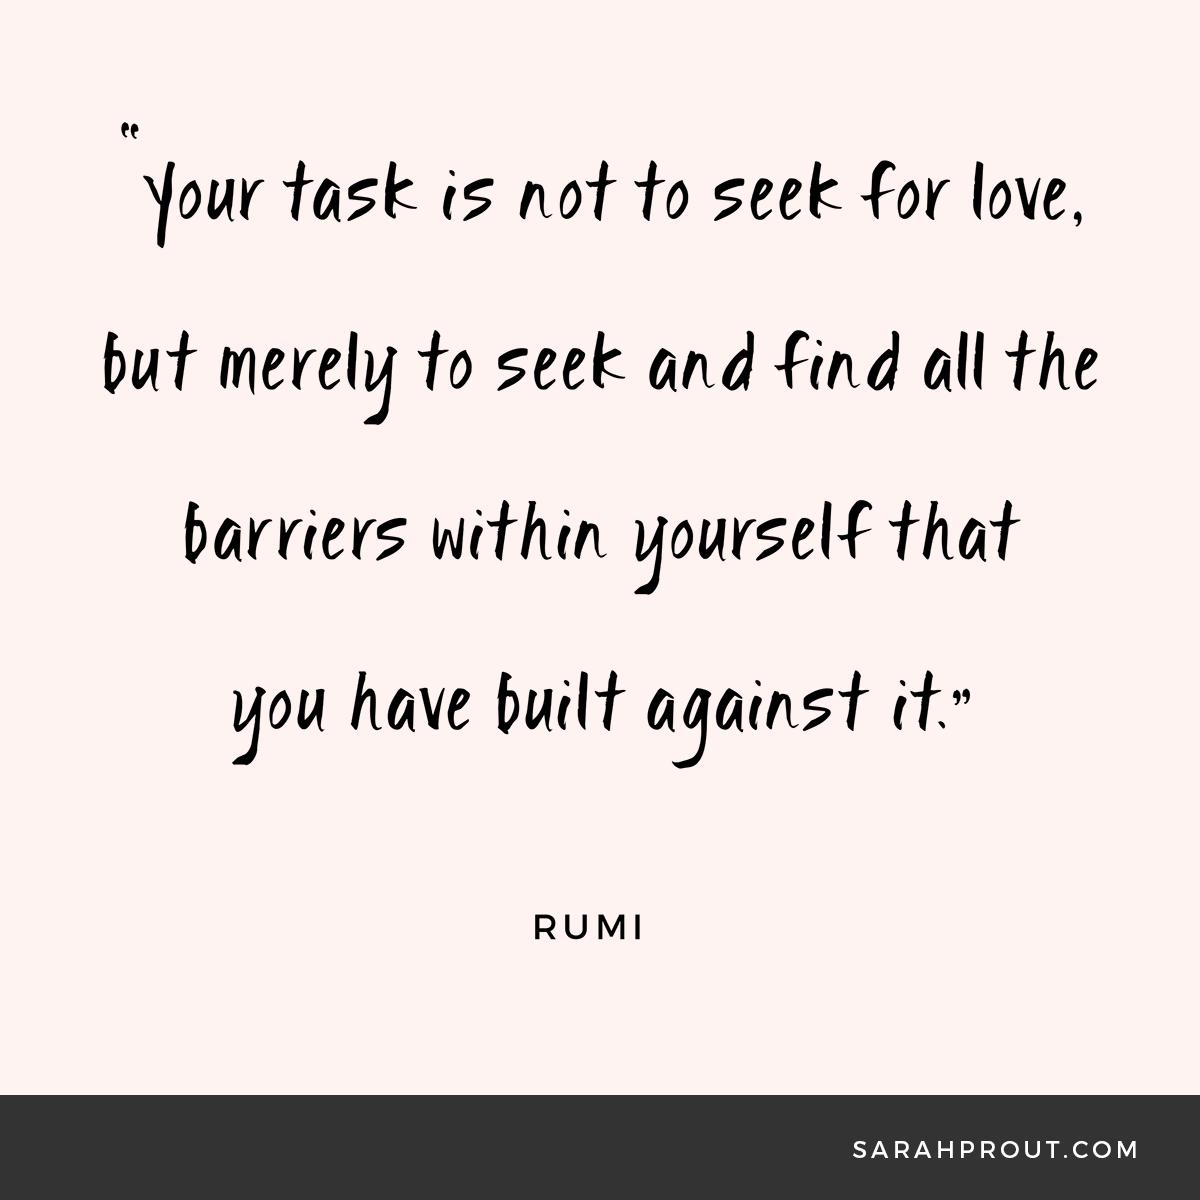 rumi-love-quote